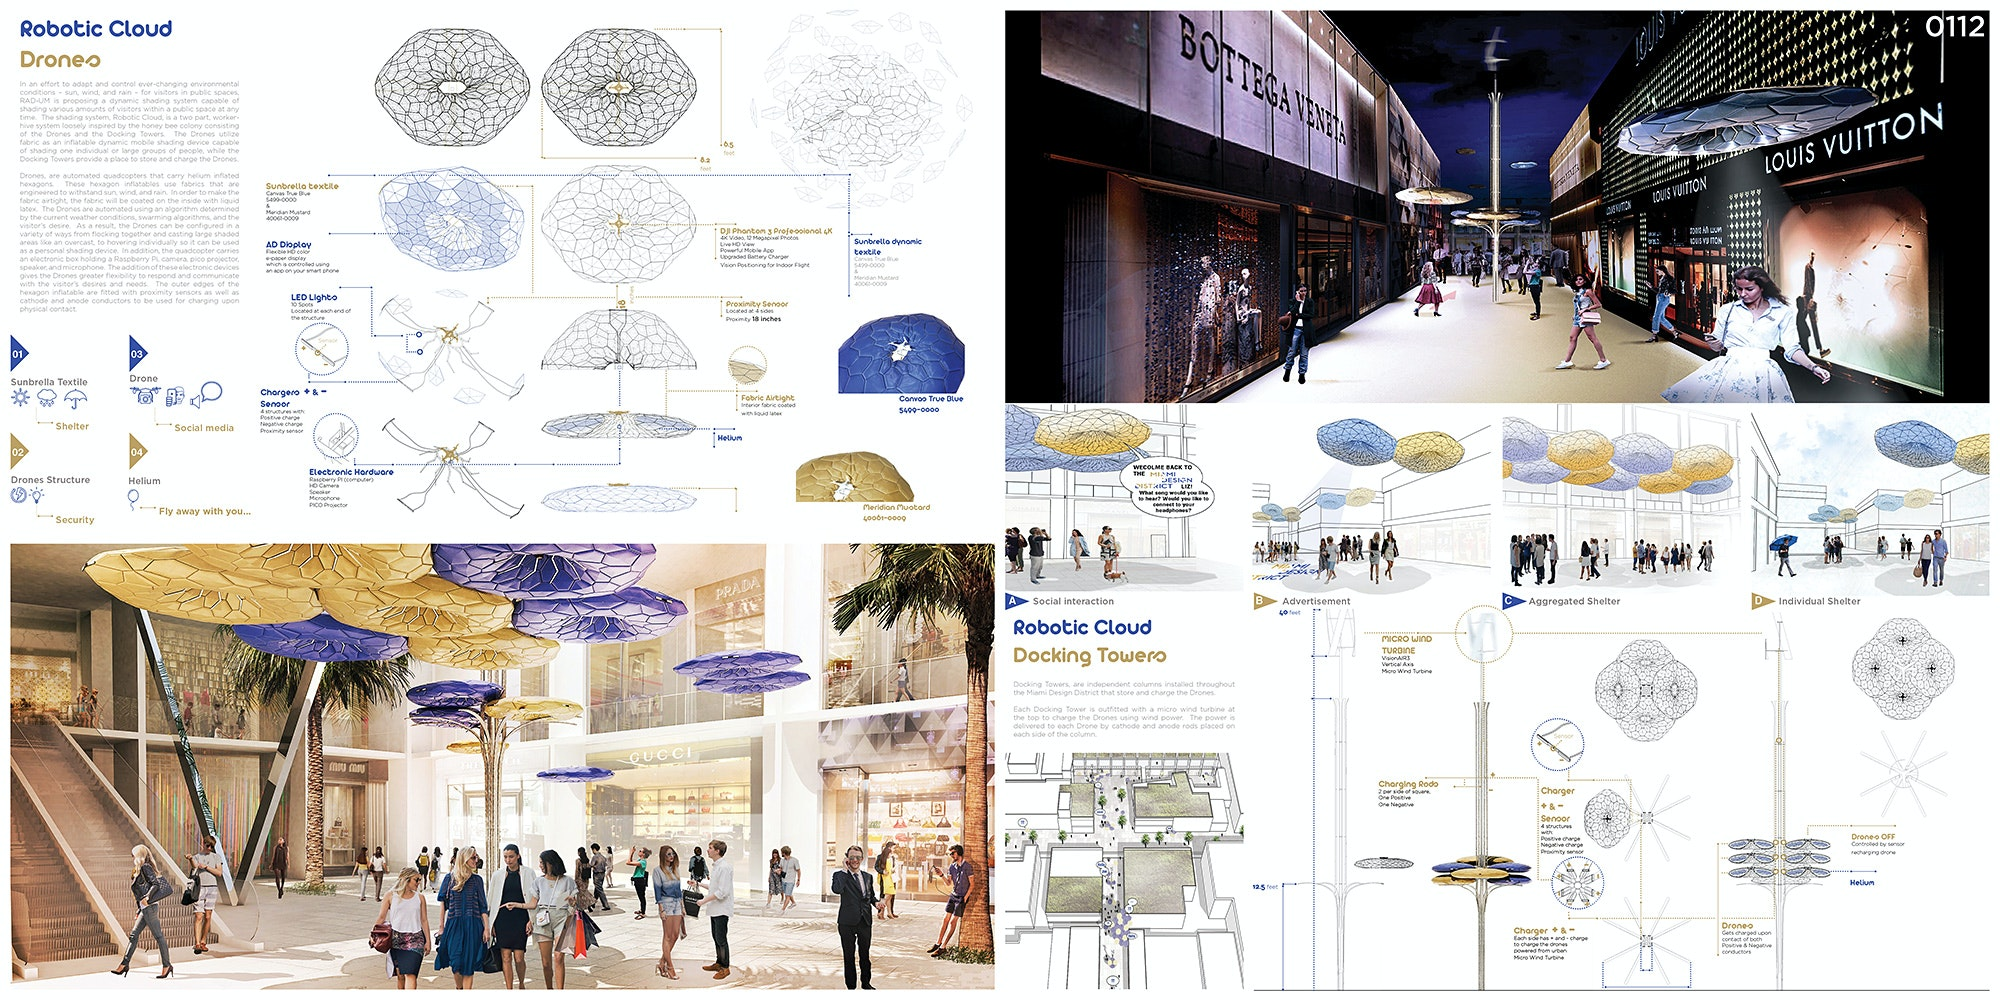 Honorable Mention: U201cRobotic Cloudu201d. Authors: School Of Architecture,  University Of